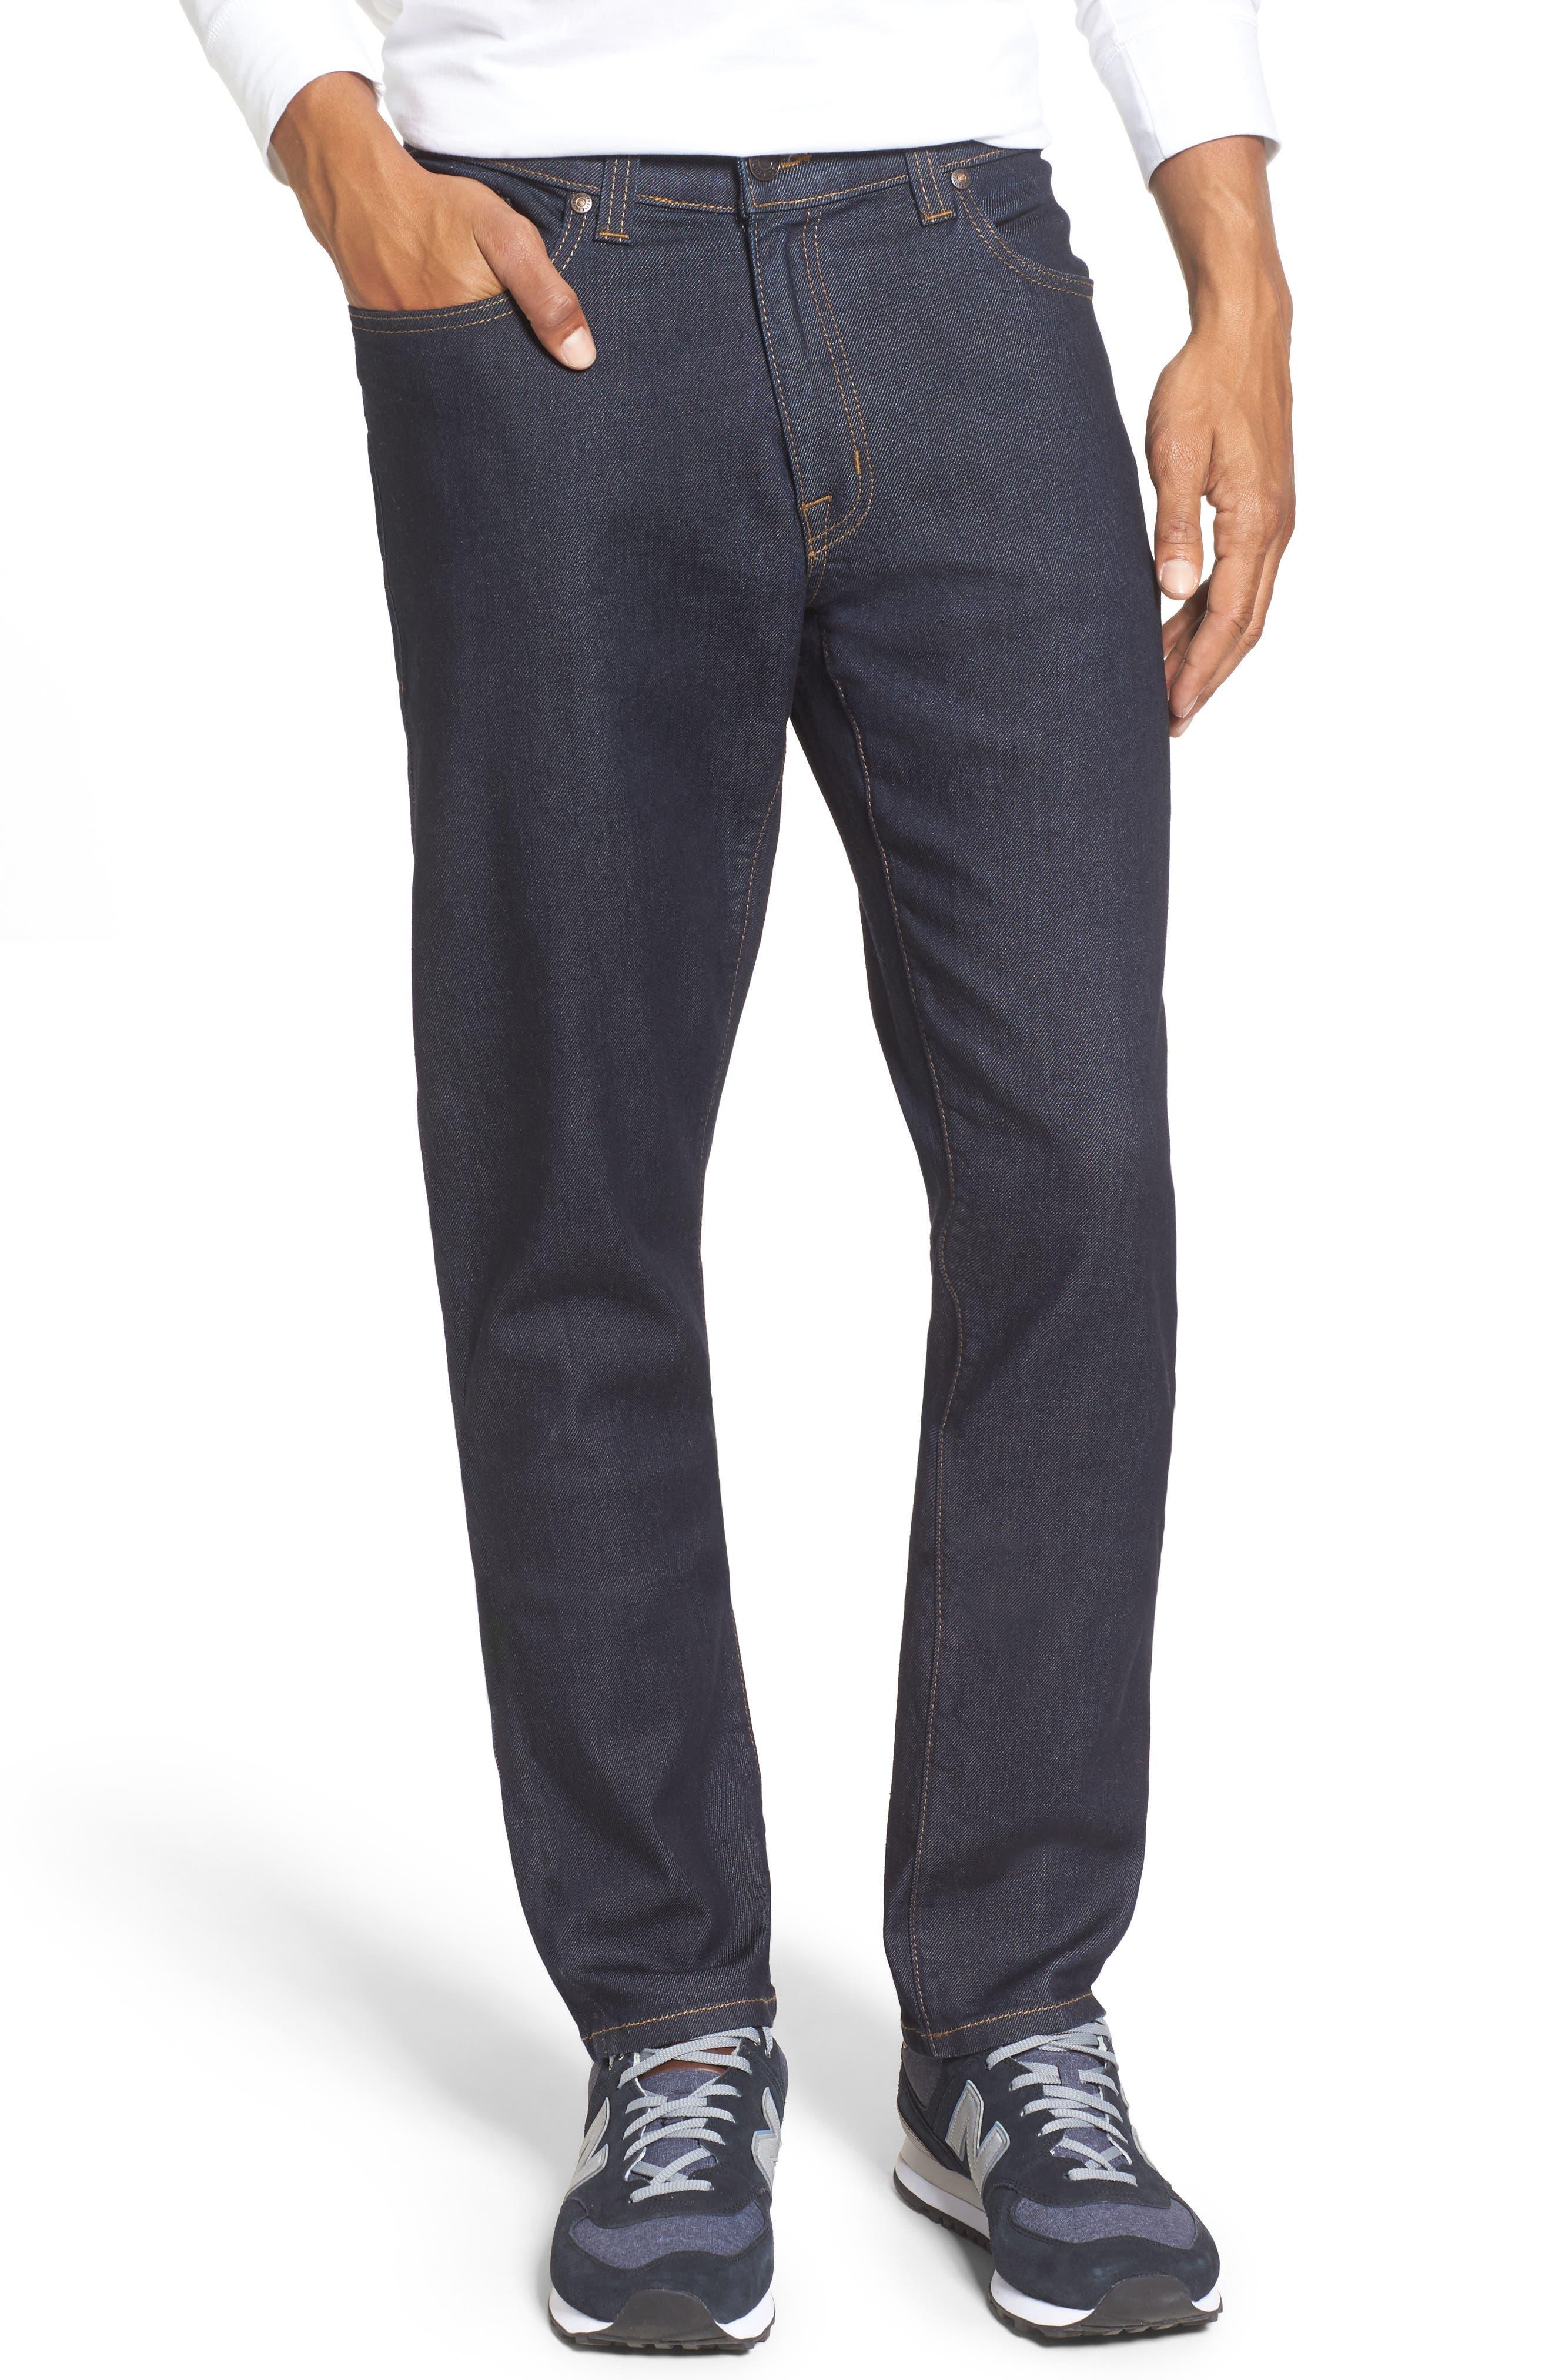 Alternate Image 1 Selected - Fidelity Denim Jimmy Slim Straight Leg Jeans (Halo Rinse)